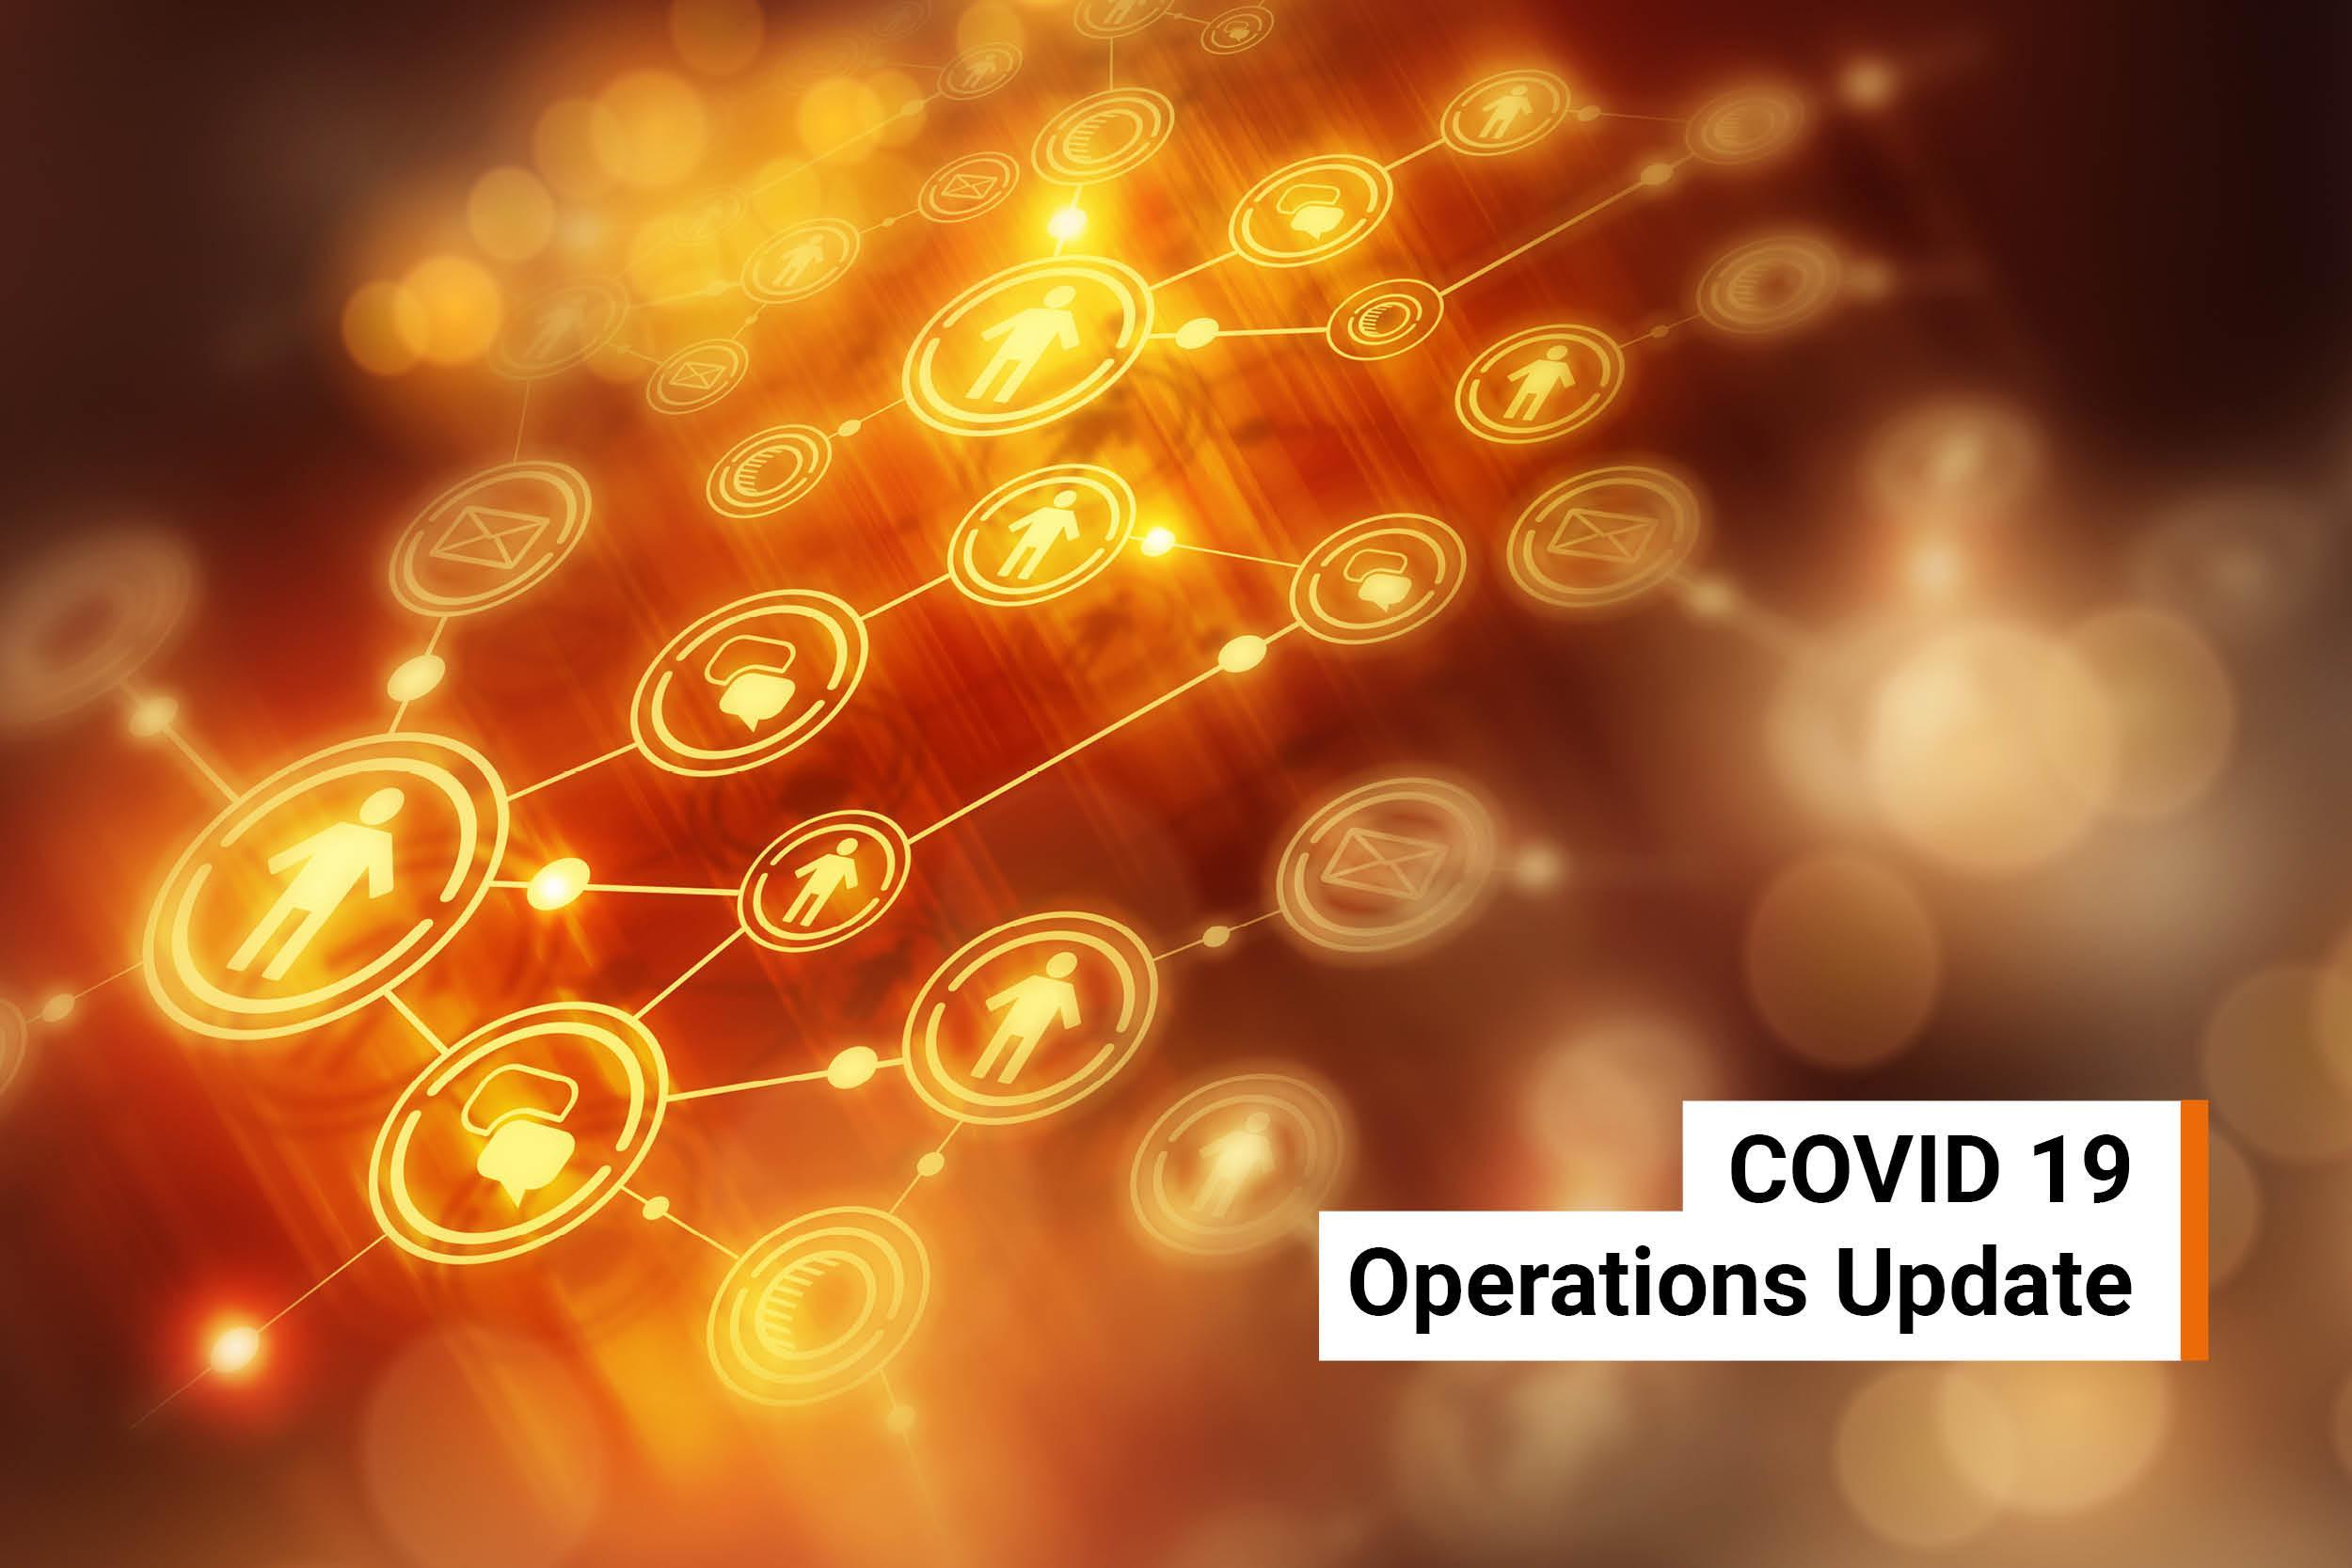 Covid-19-Operations Update